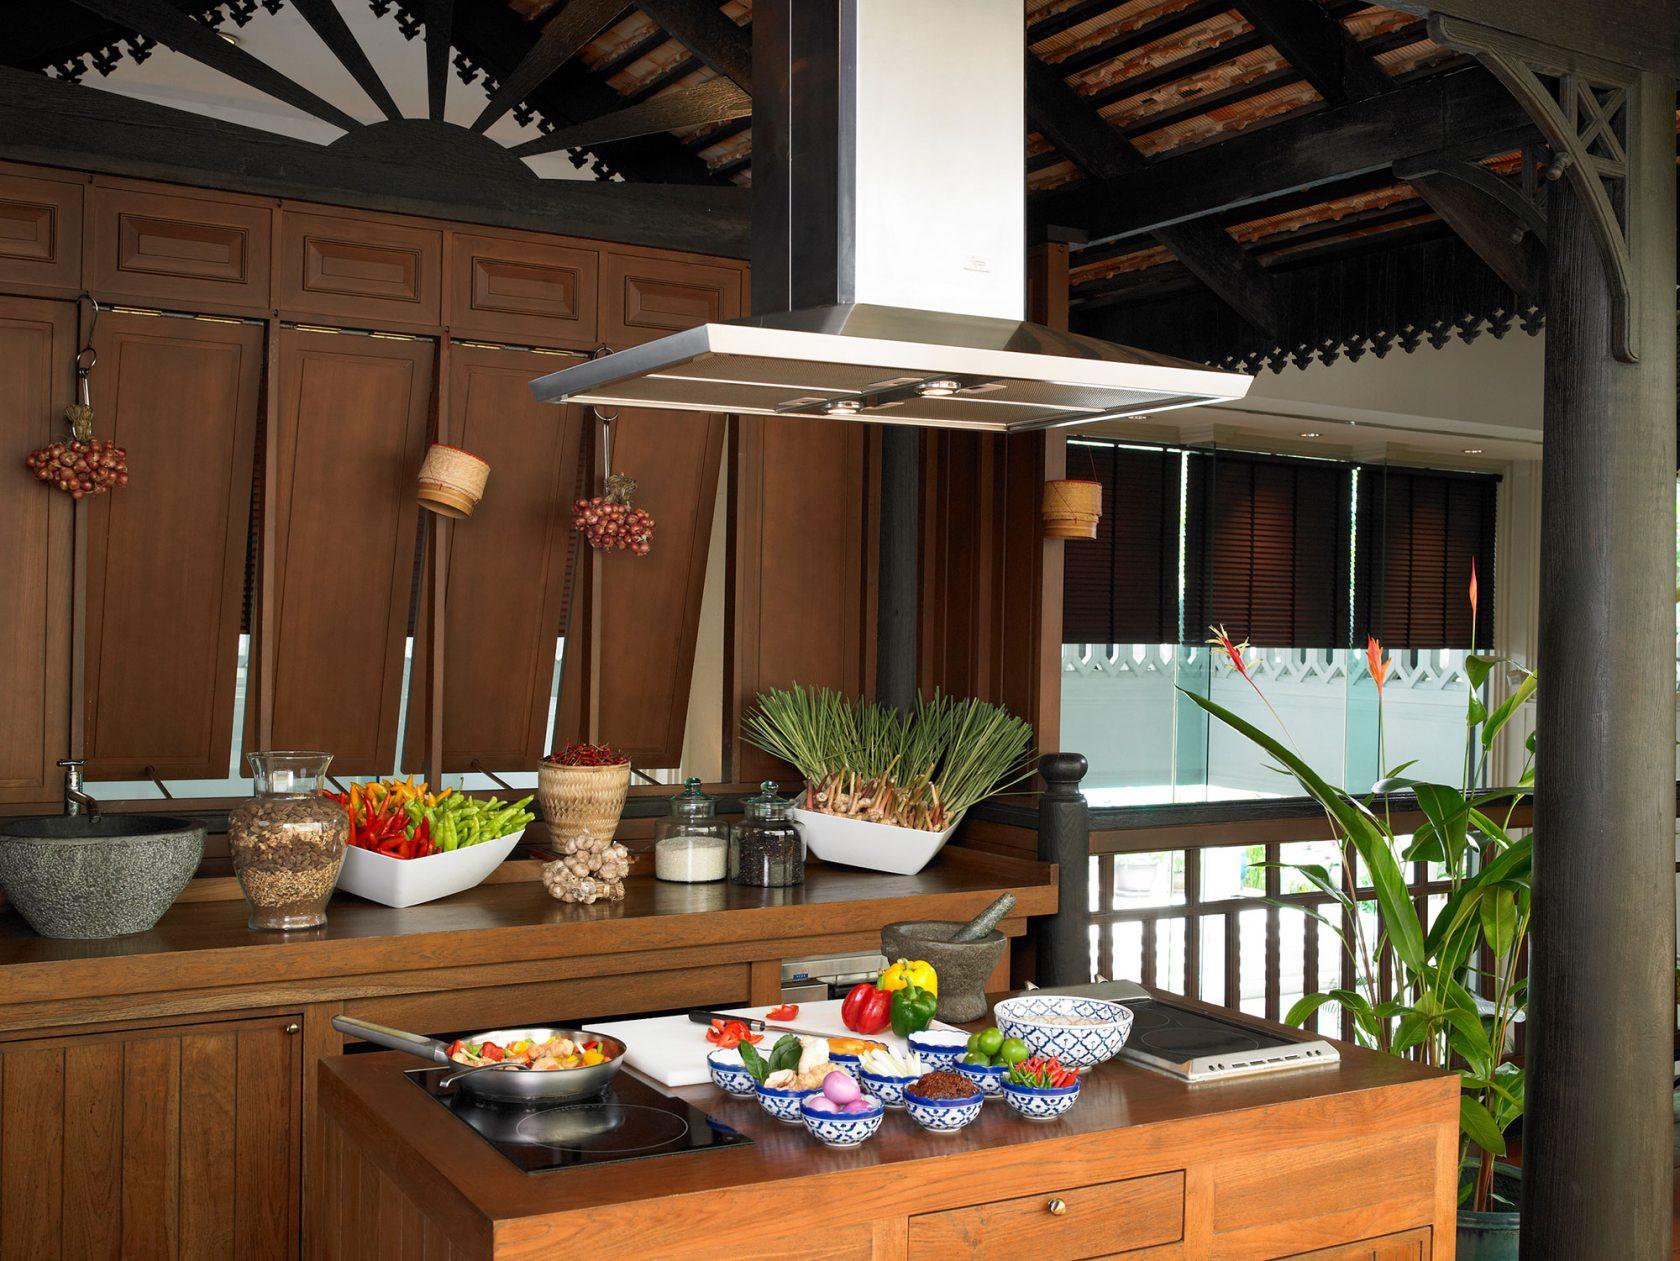 Anantara Riverside Bangkok Cooking Class